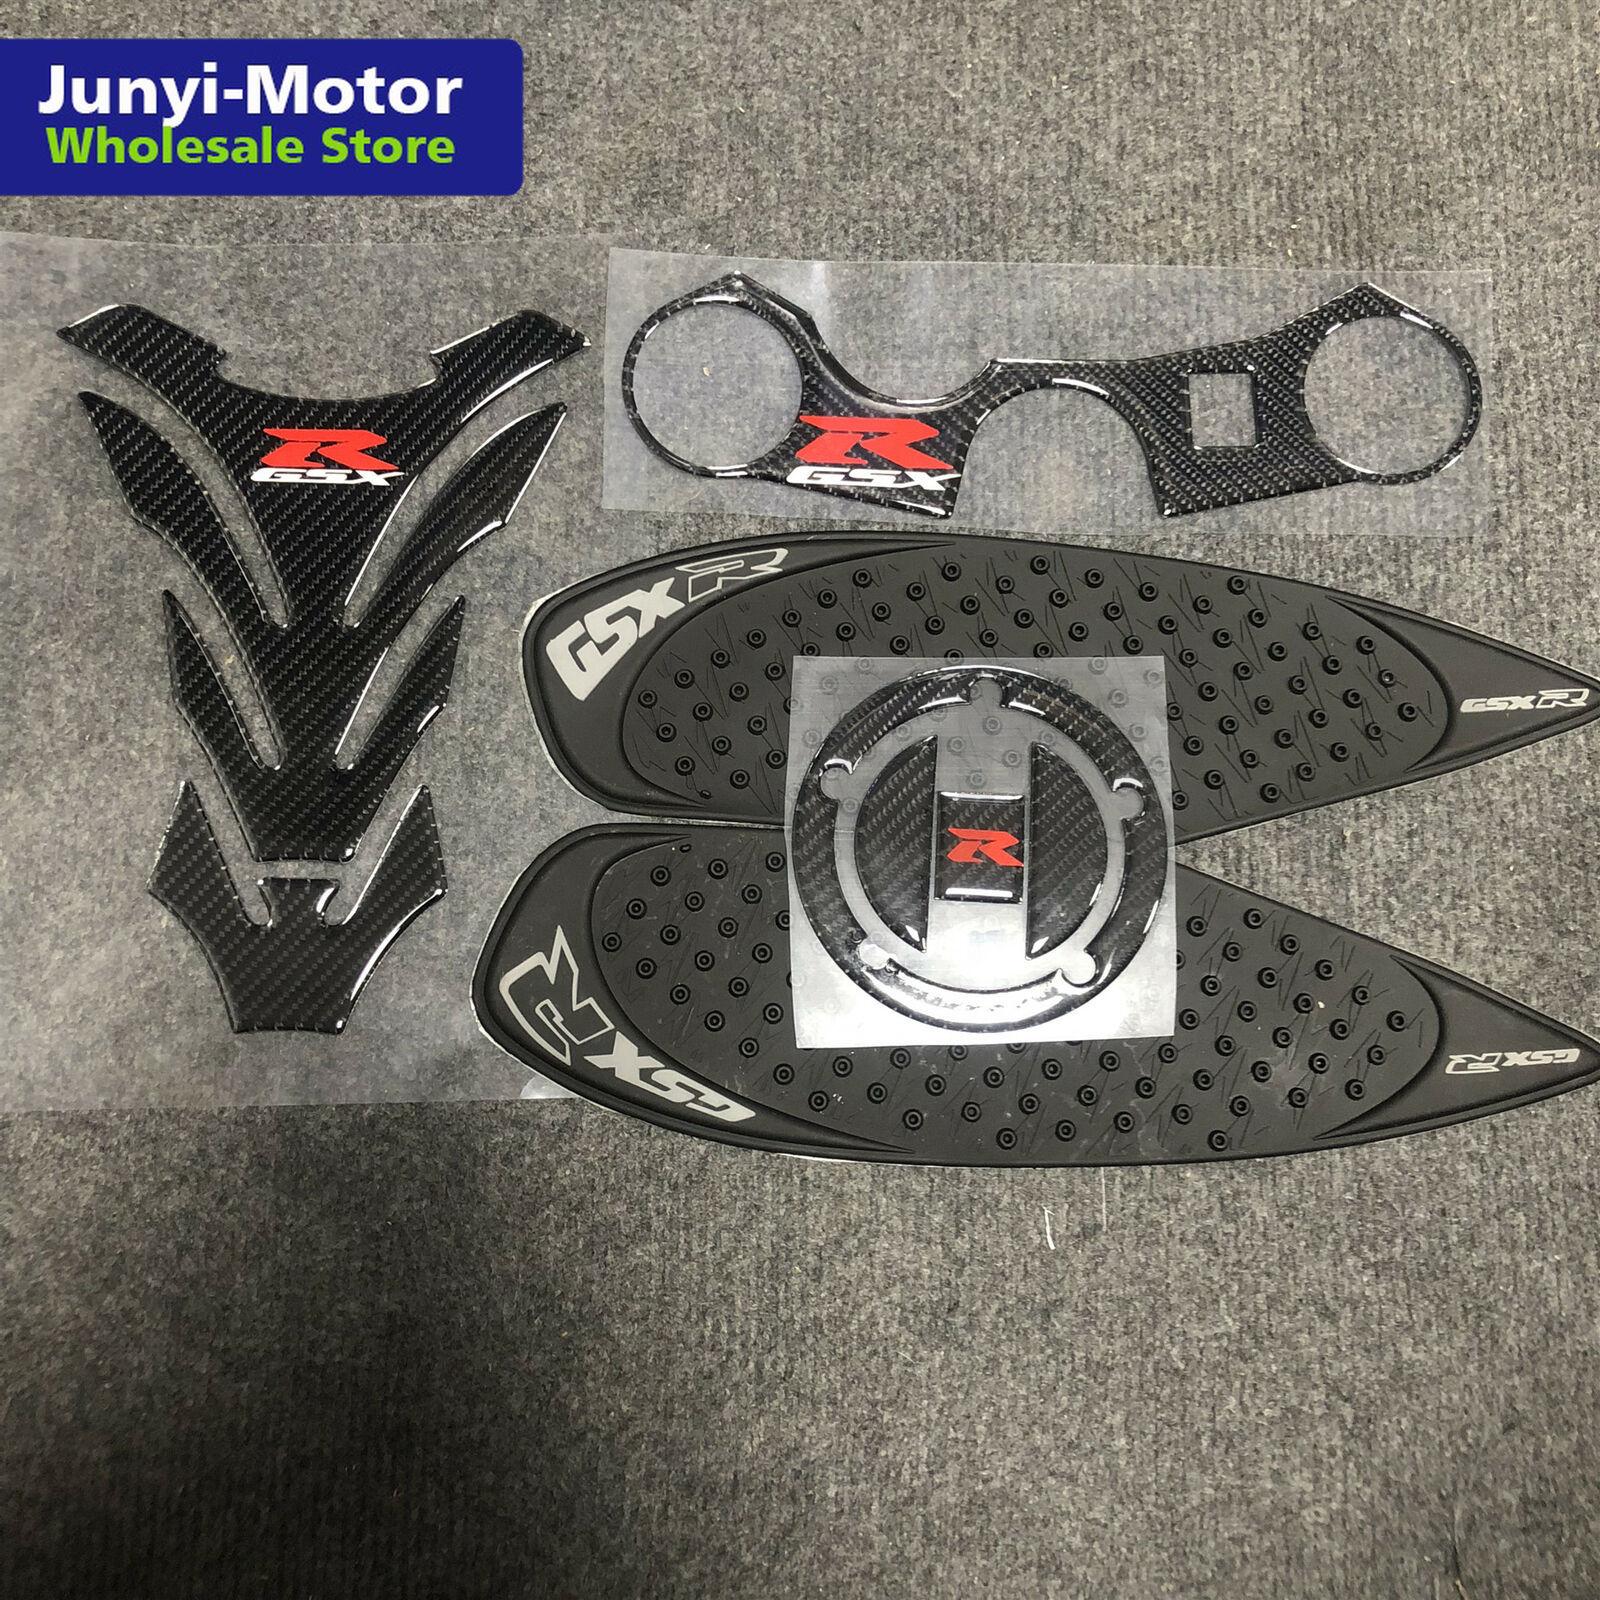 Накладка на бак мотоцикла с тройным передним концом, верхний зажим, наклейка из углеродного волокна для Suzuki GSX-R GSXR 750 600 K6 K8 2006-2010